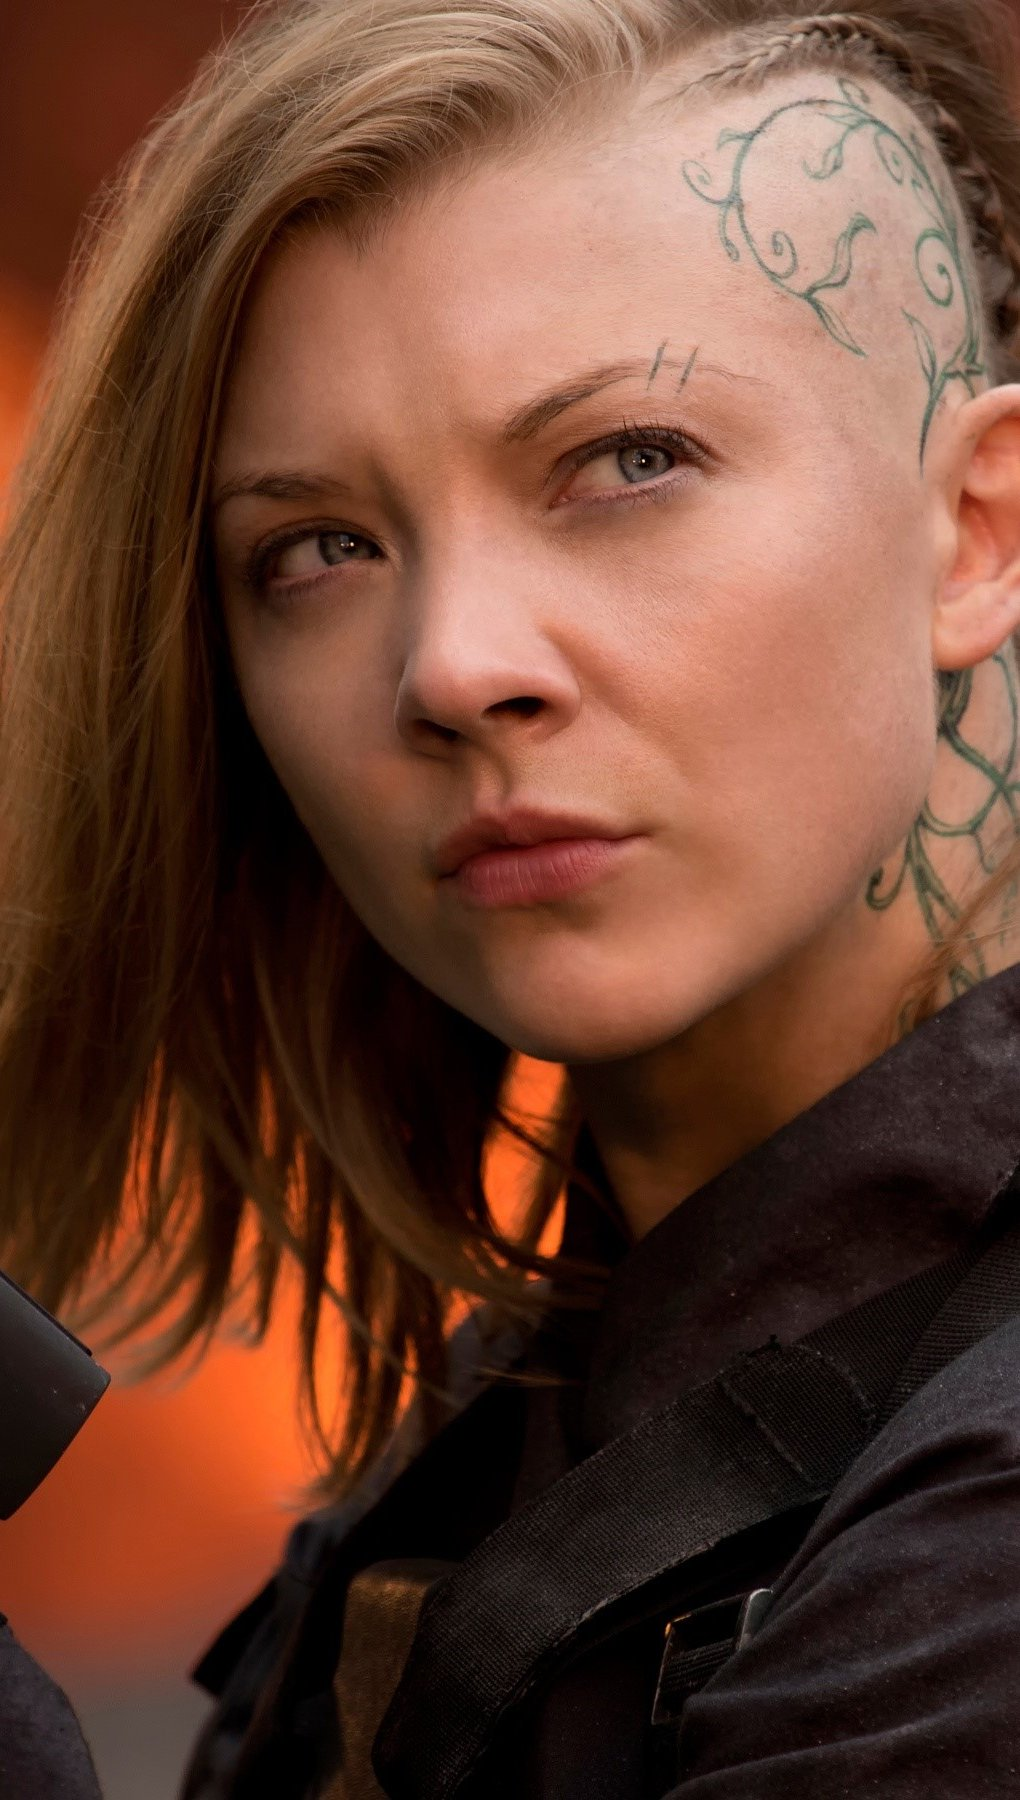 Fondos de pantalla Natalie Dormer como Cressida Vertical